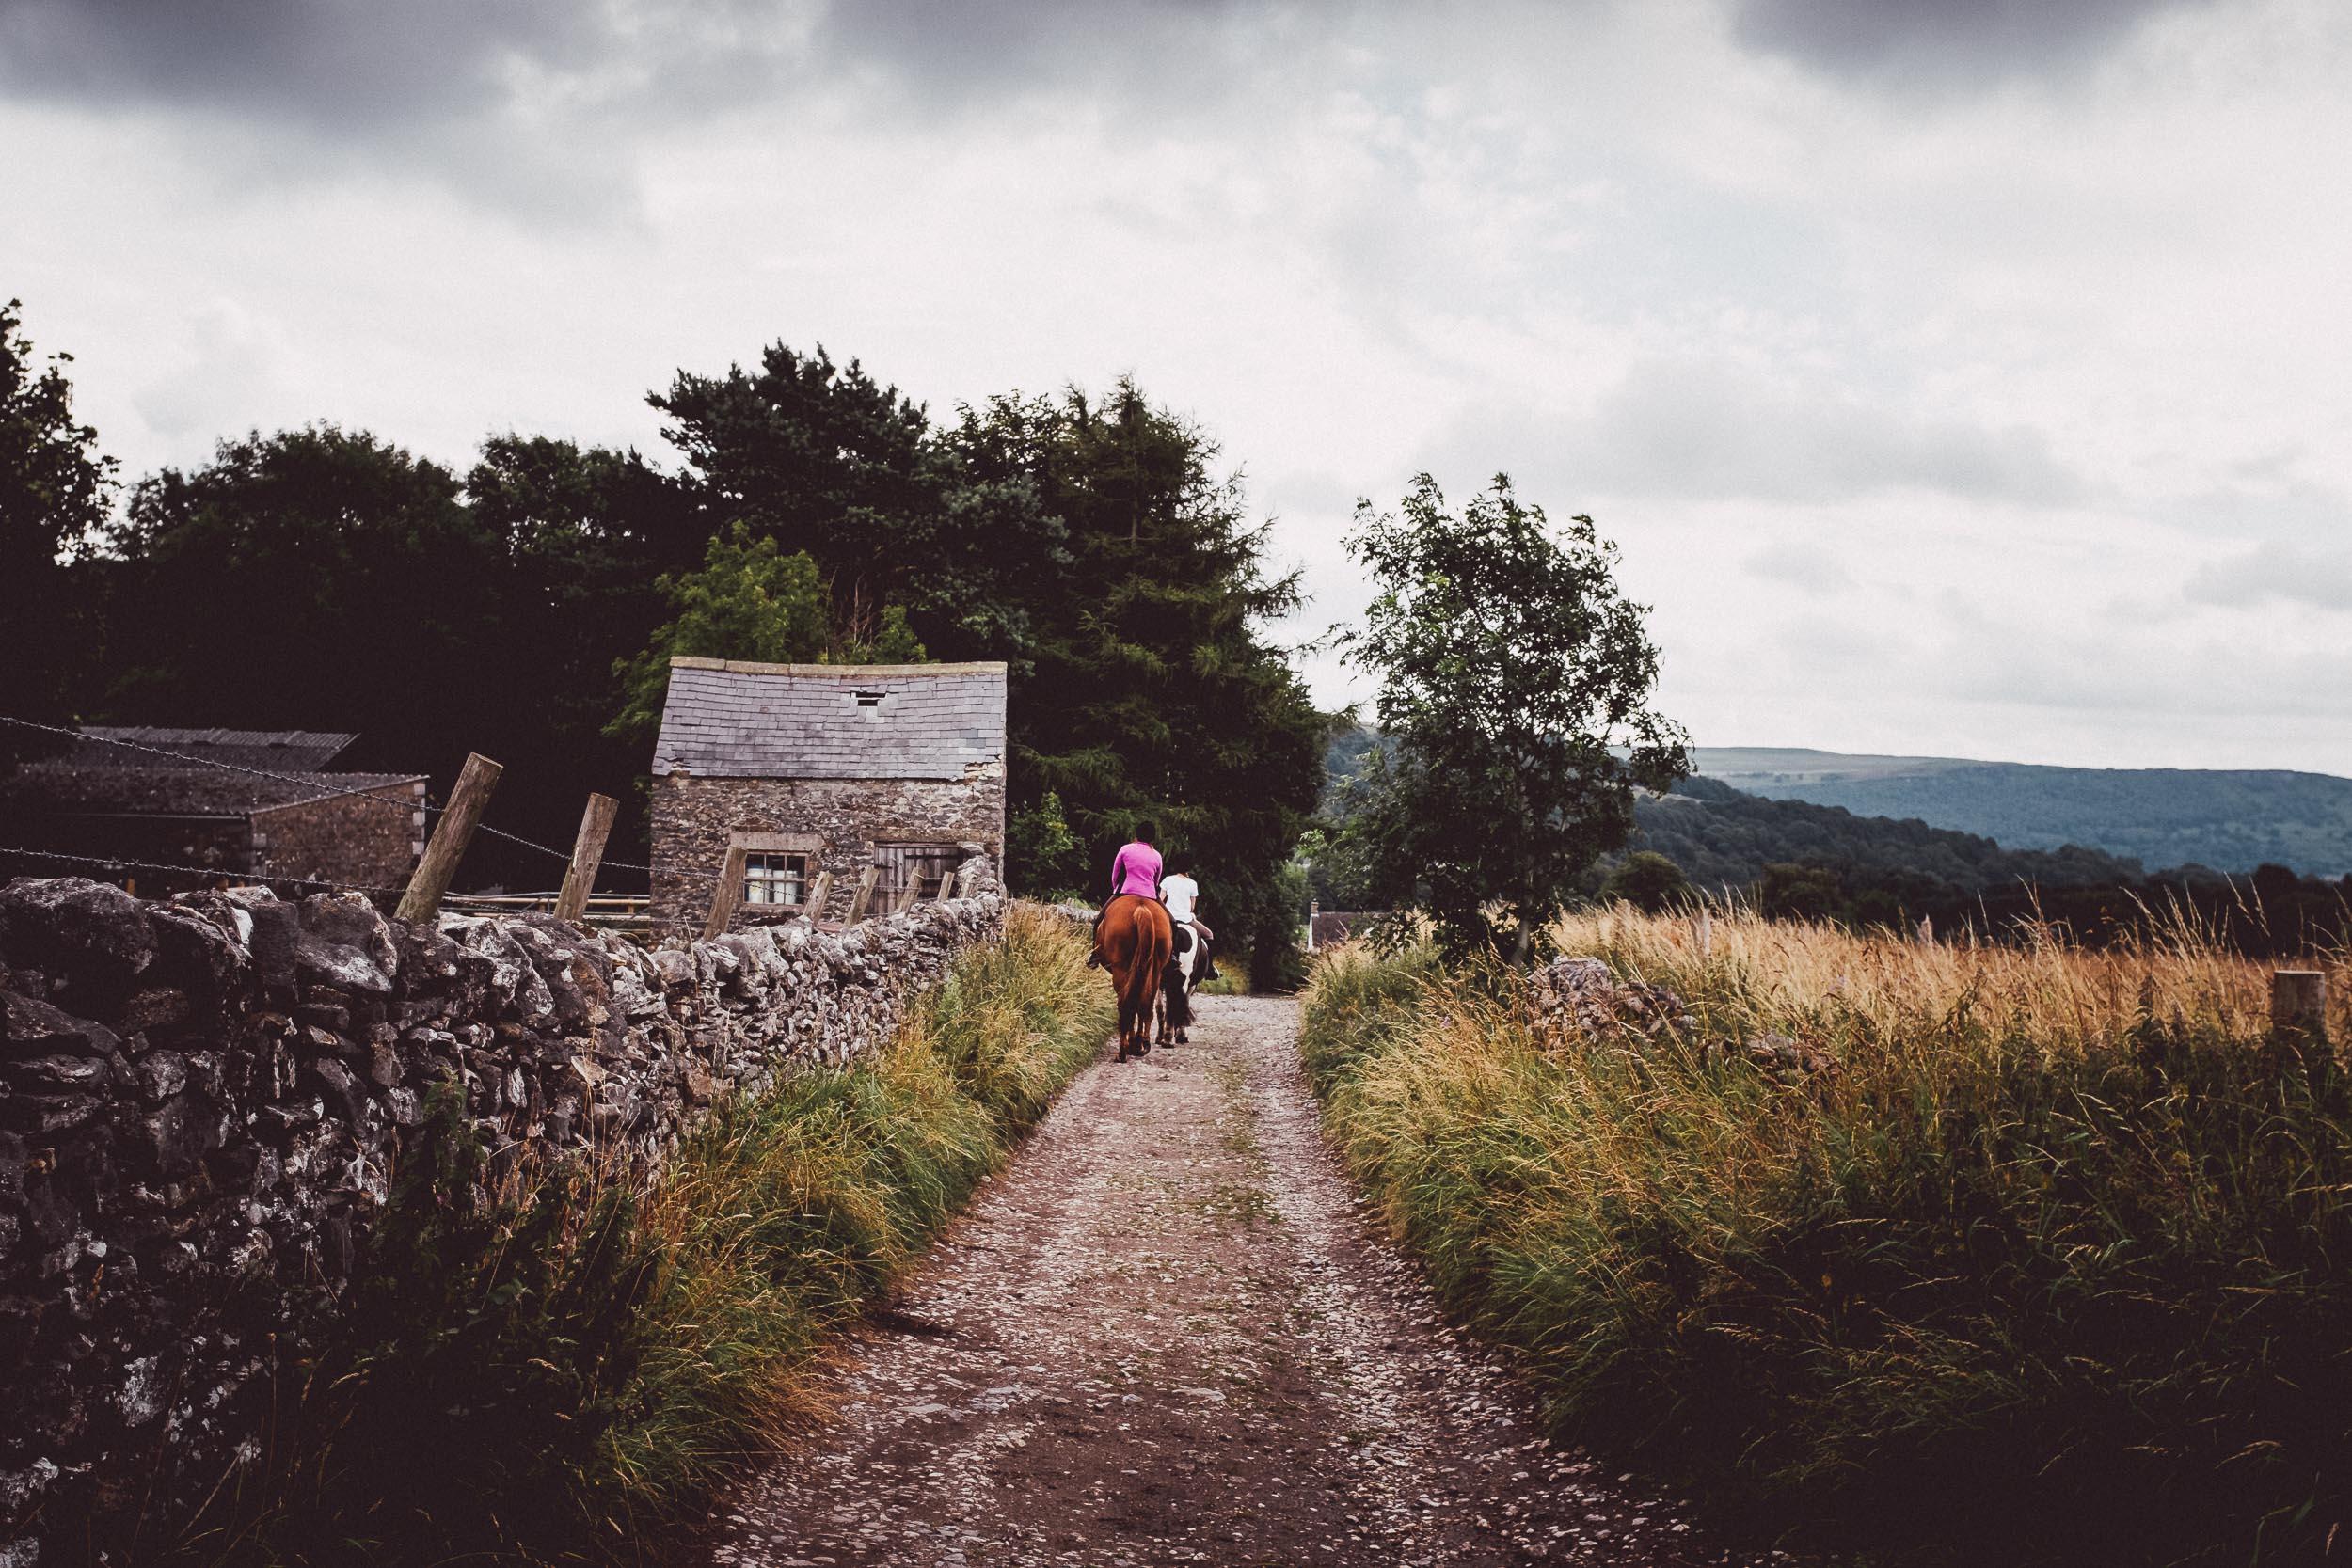 Horses on the Lane